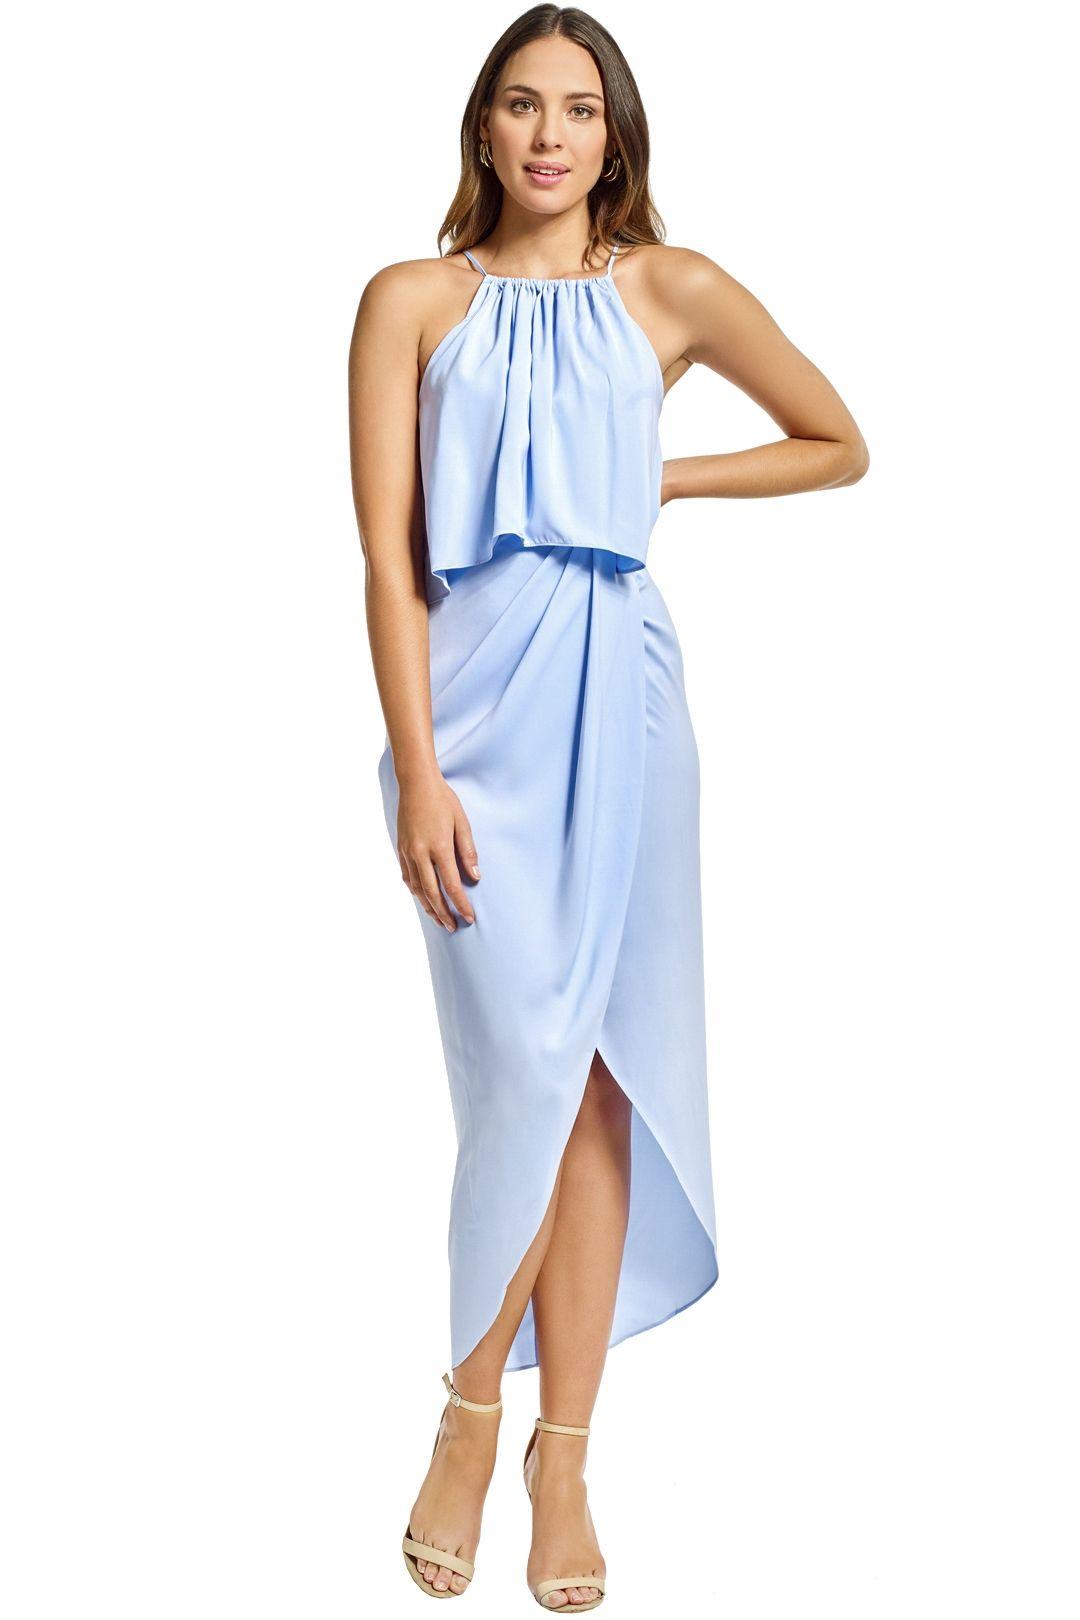 Shona Joy - Frill High Neck Drape Maxi Dress - Cornflower Blue - Front